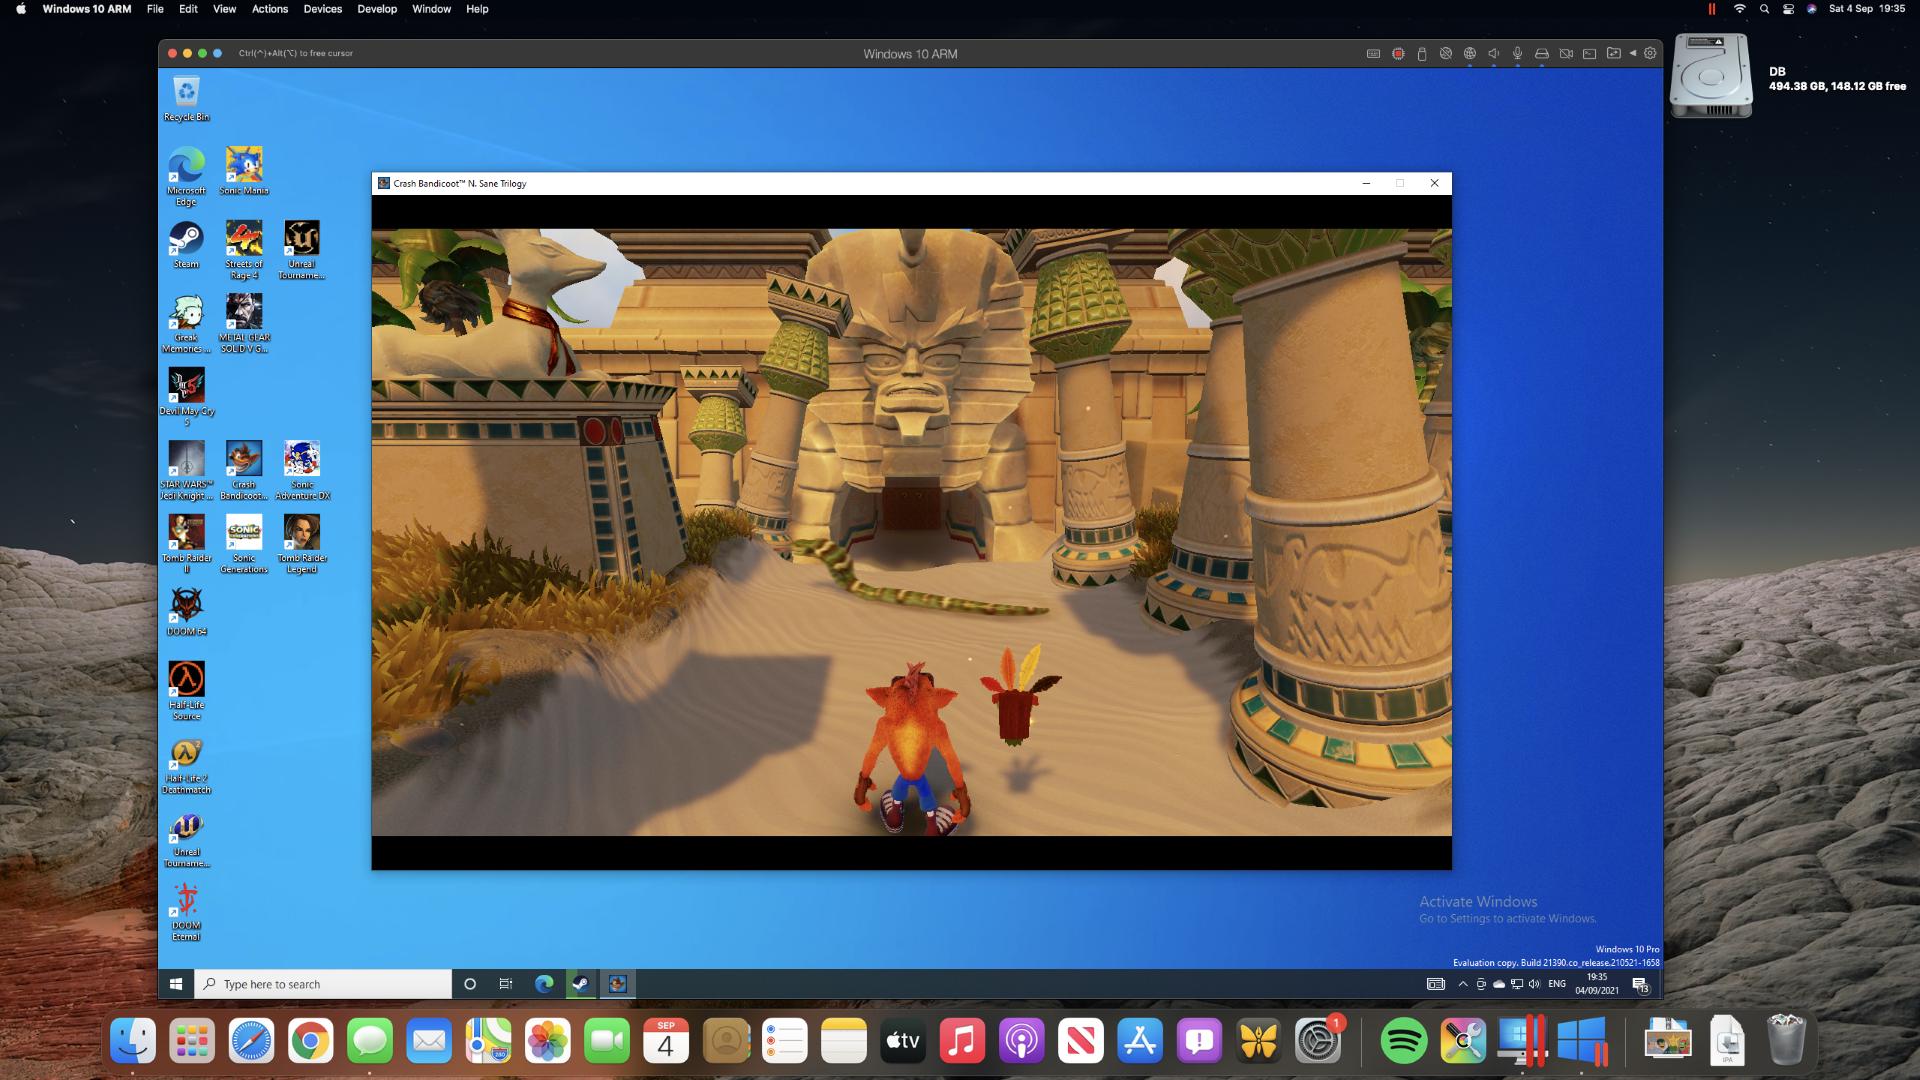 Crash Bandicoot 3 running in Parallels Desktop on a Mac mini M1